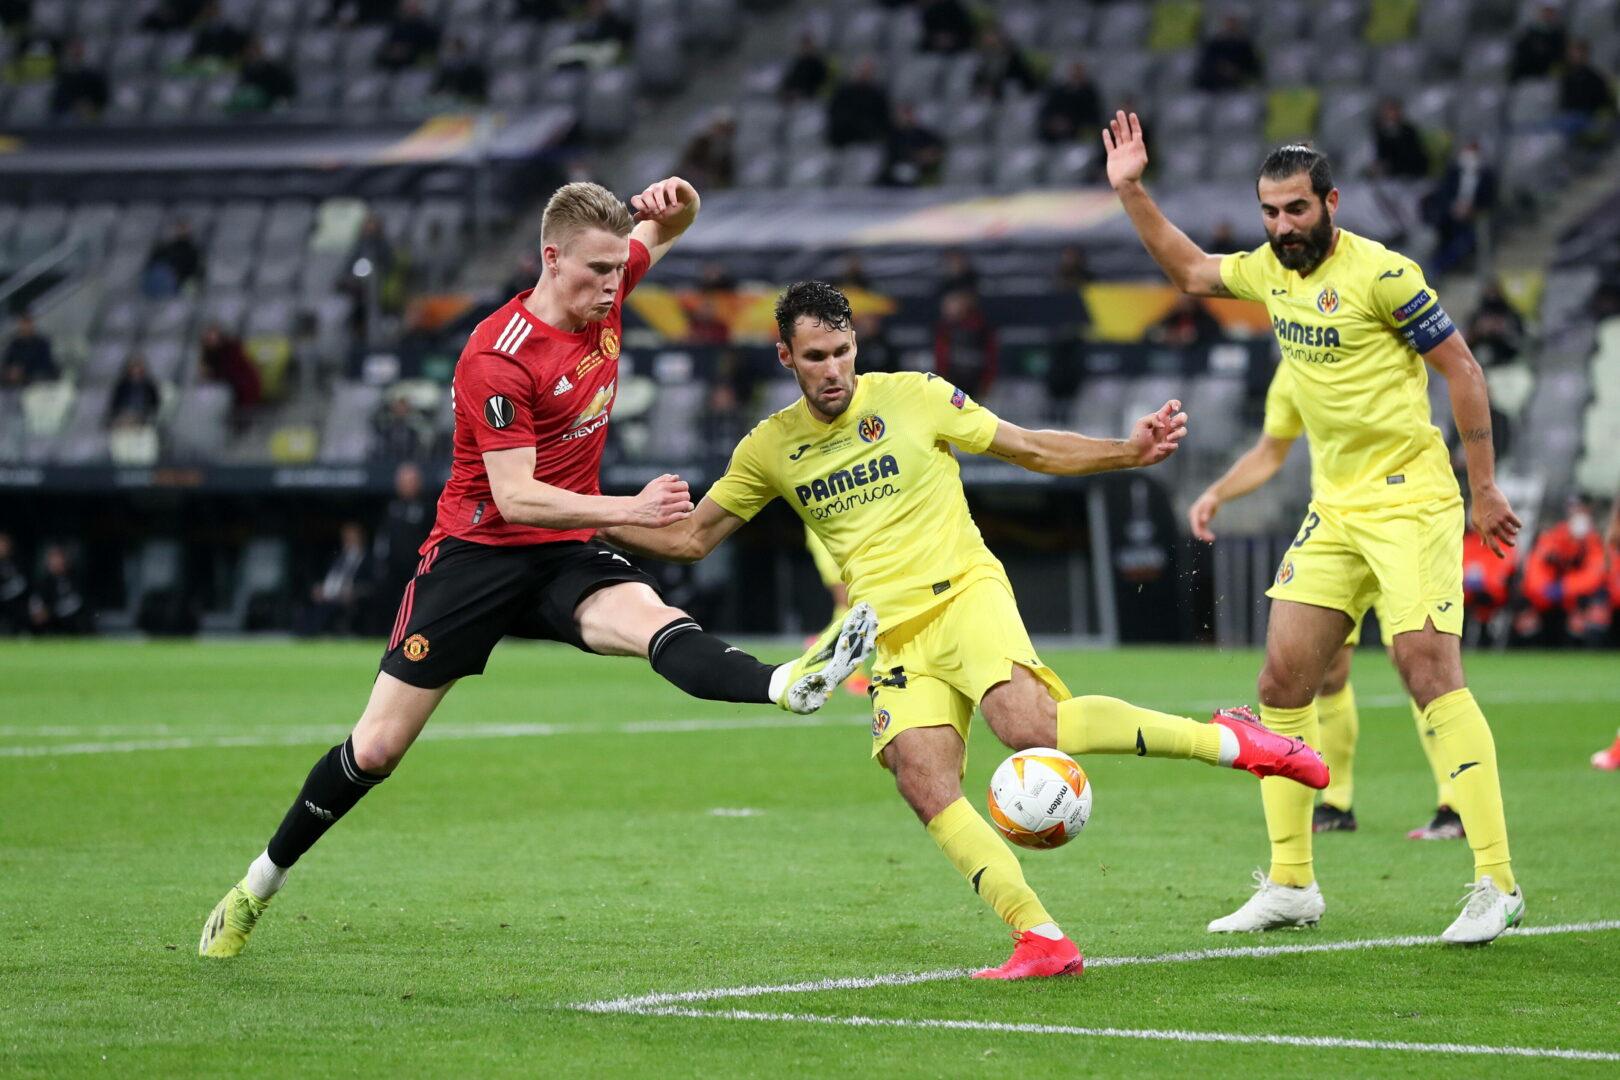 Champions League: Gruppe F mit Villarreal, Manchester United, Atalanta und den Young Boys